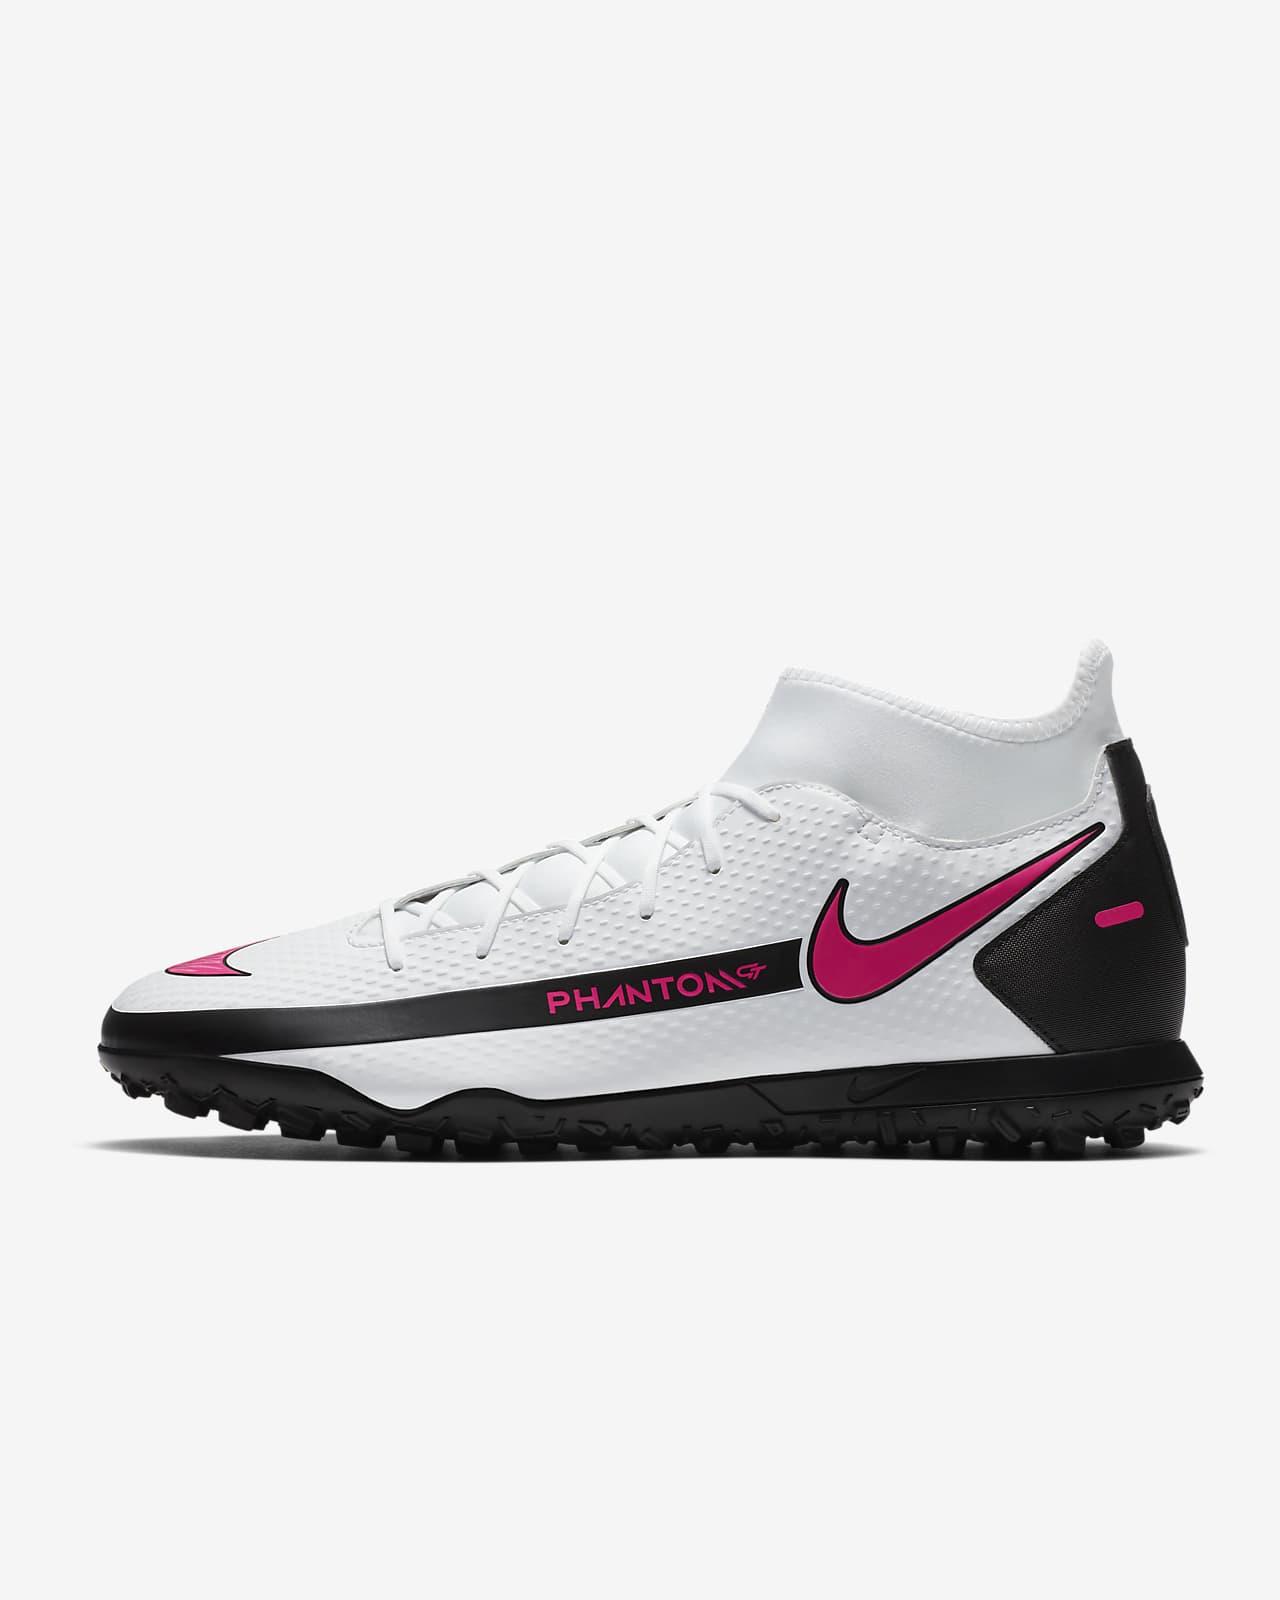 Nike Phantom GT Club Dynamic Fit TF Halı Saha Kramponu